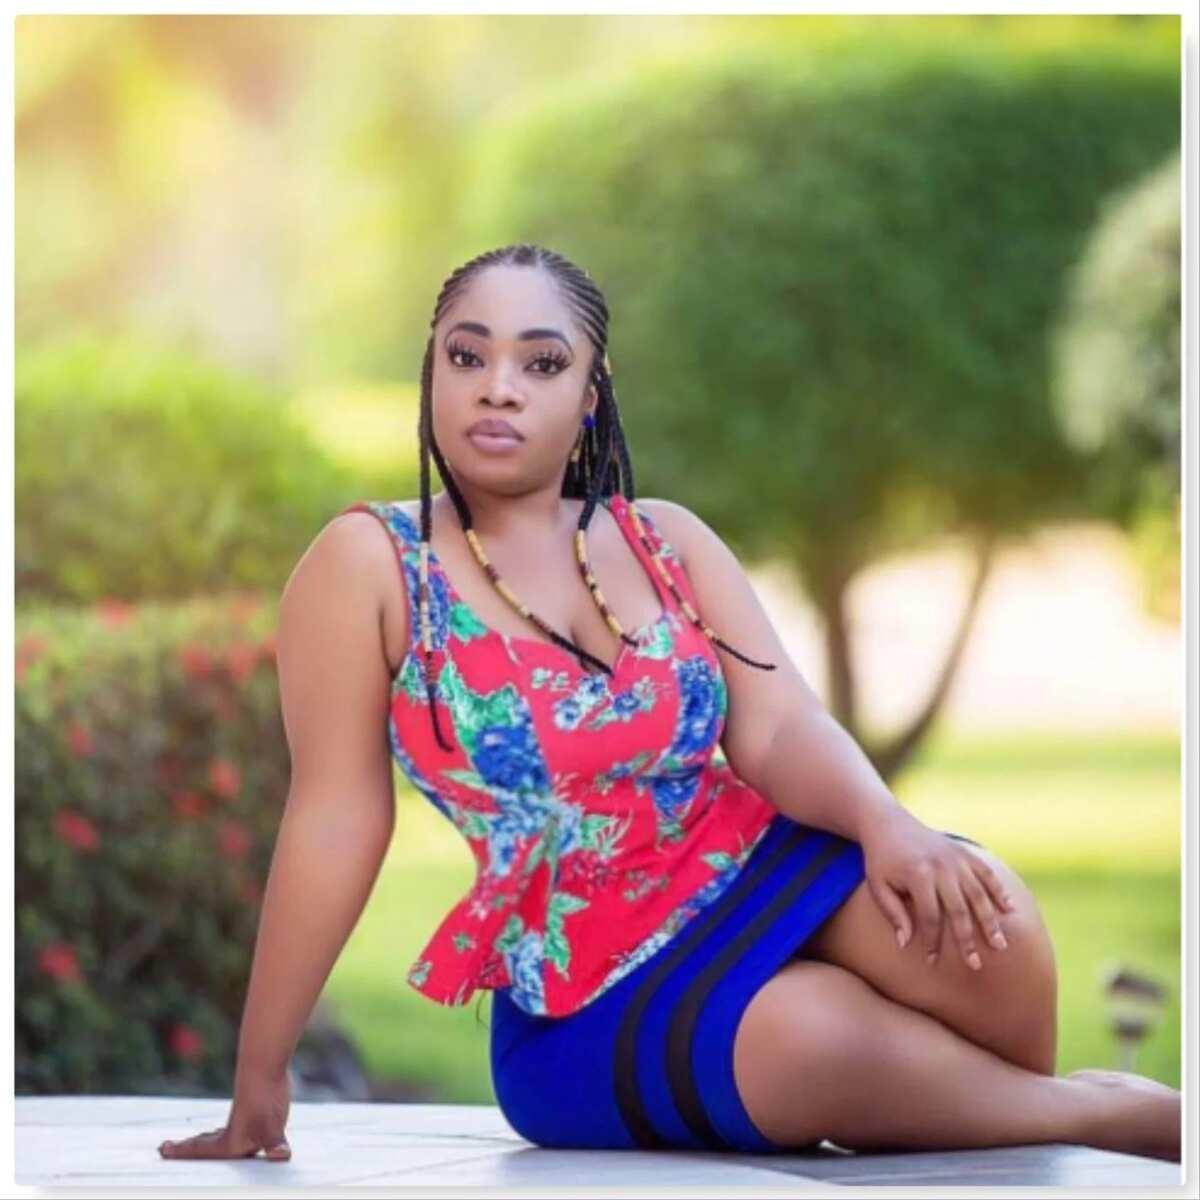 Moesha Boduongs 'wows' social media with stunning photos